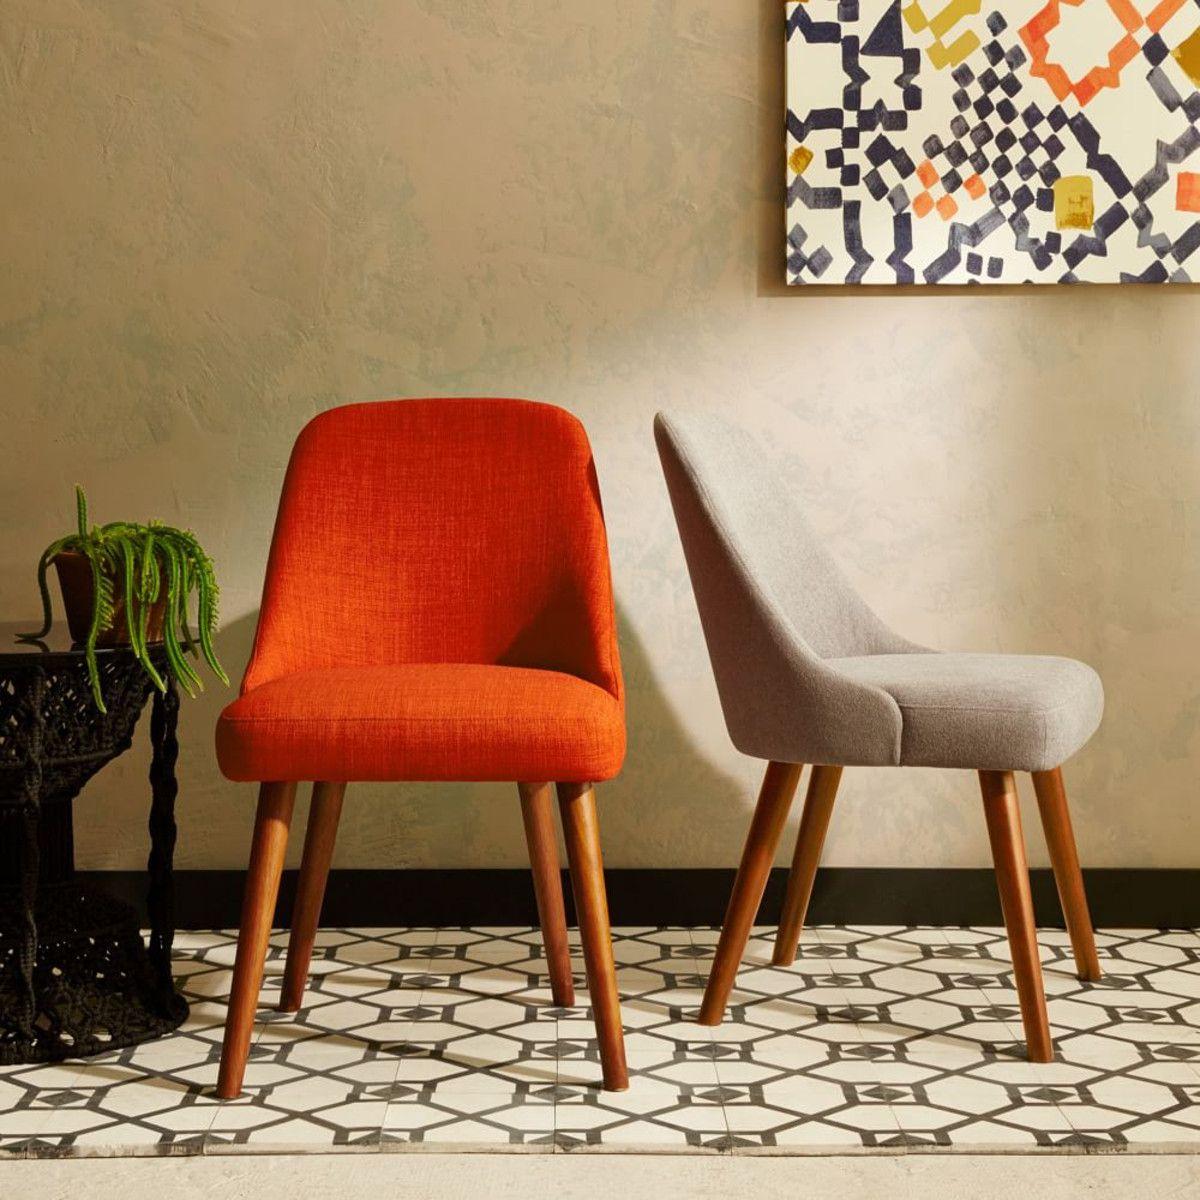 Mid-Century Dining Chairs - Walnut Legs | west elm ...